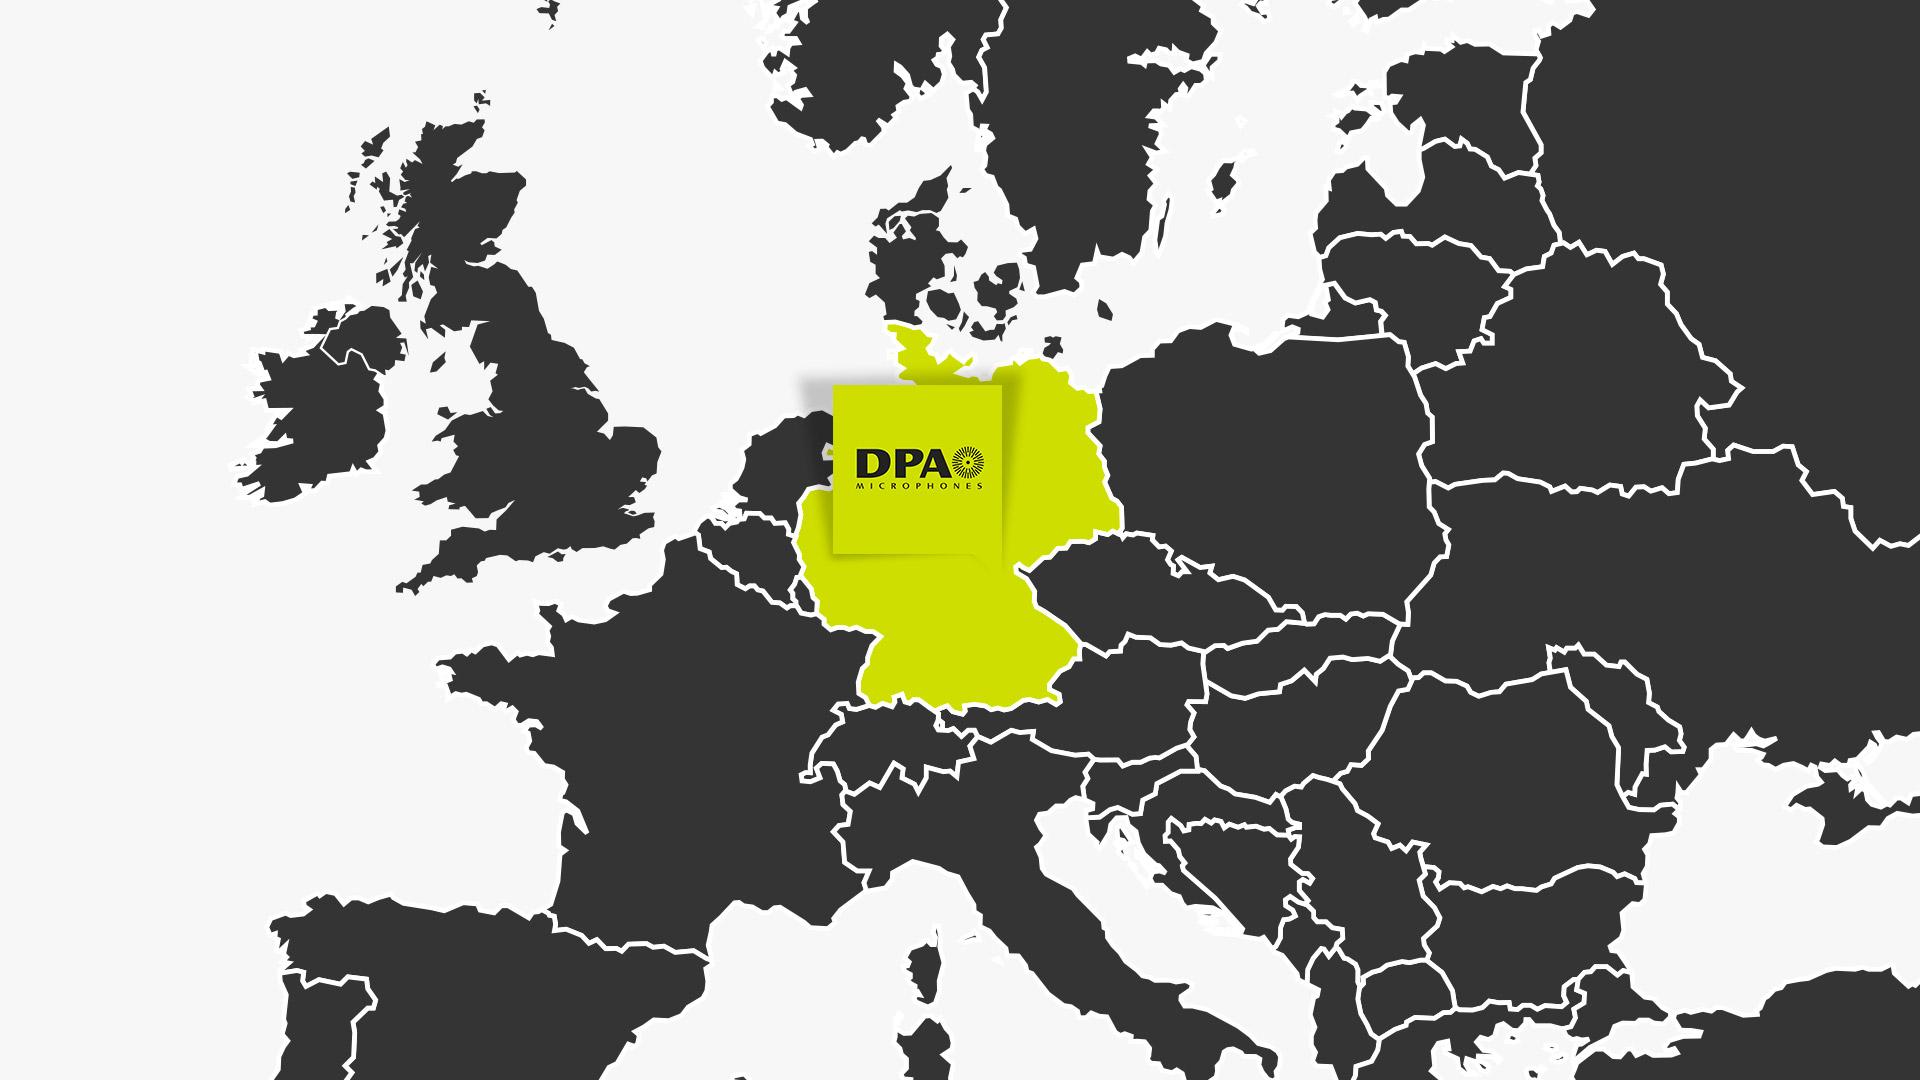 DPA-Germany.jpg